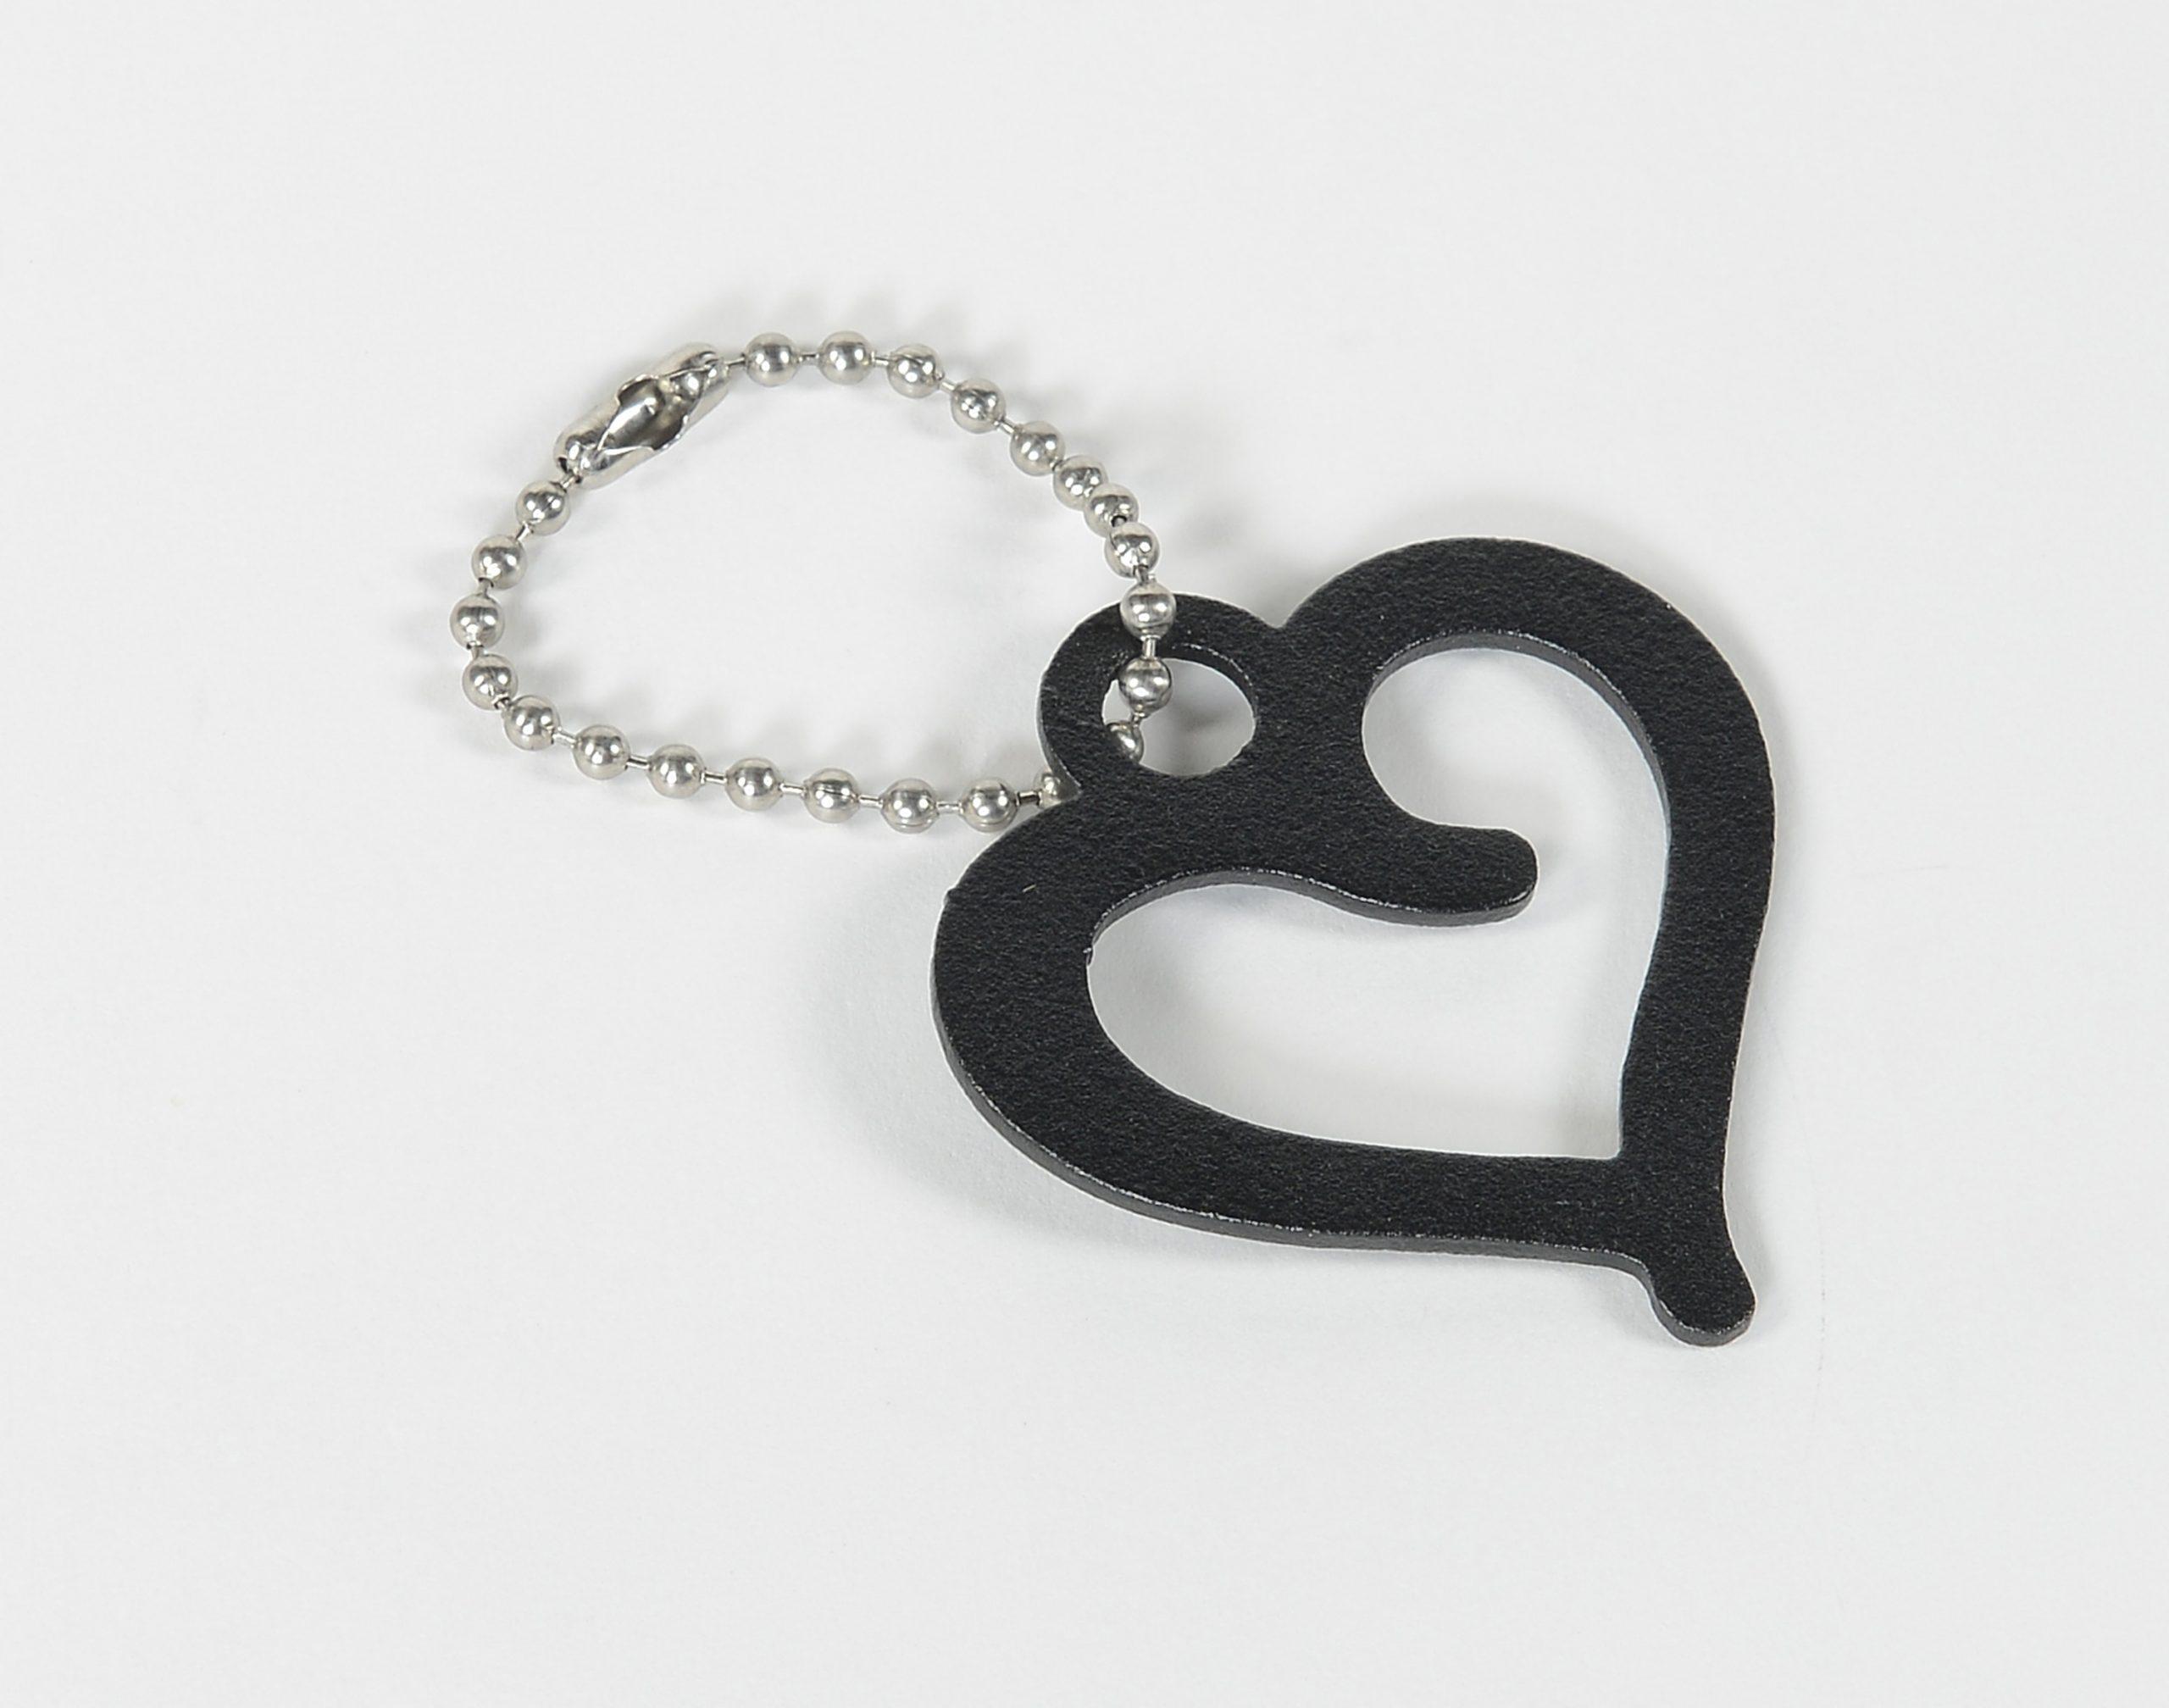 Porte-clefs Coeur Design